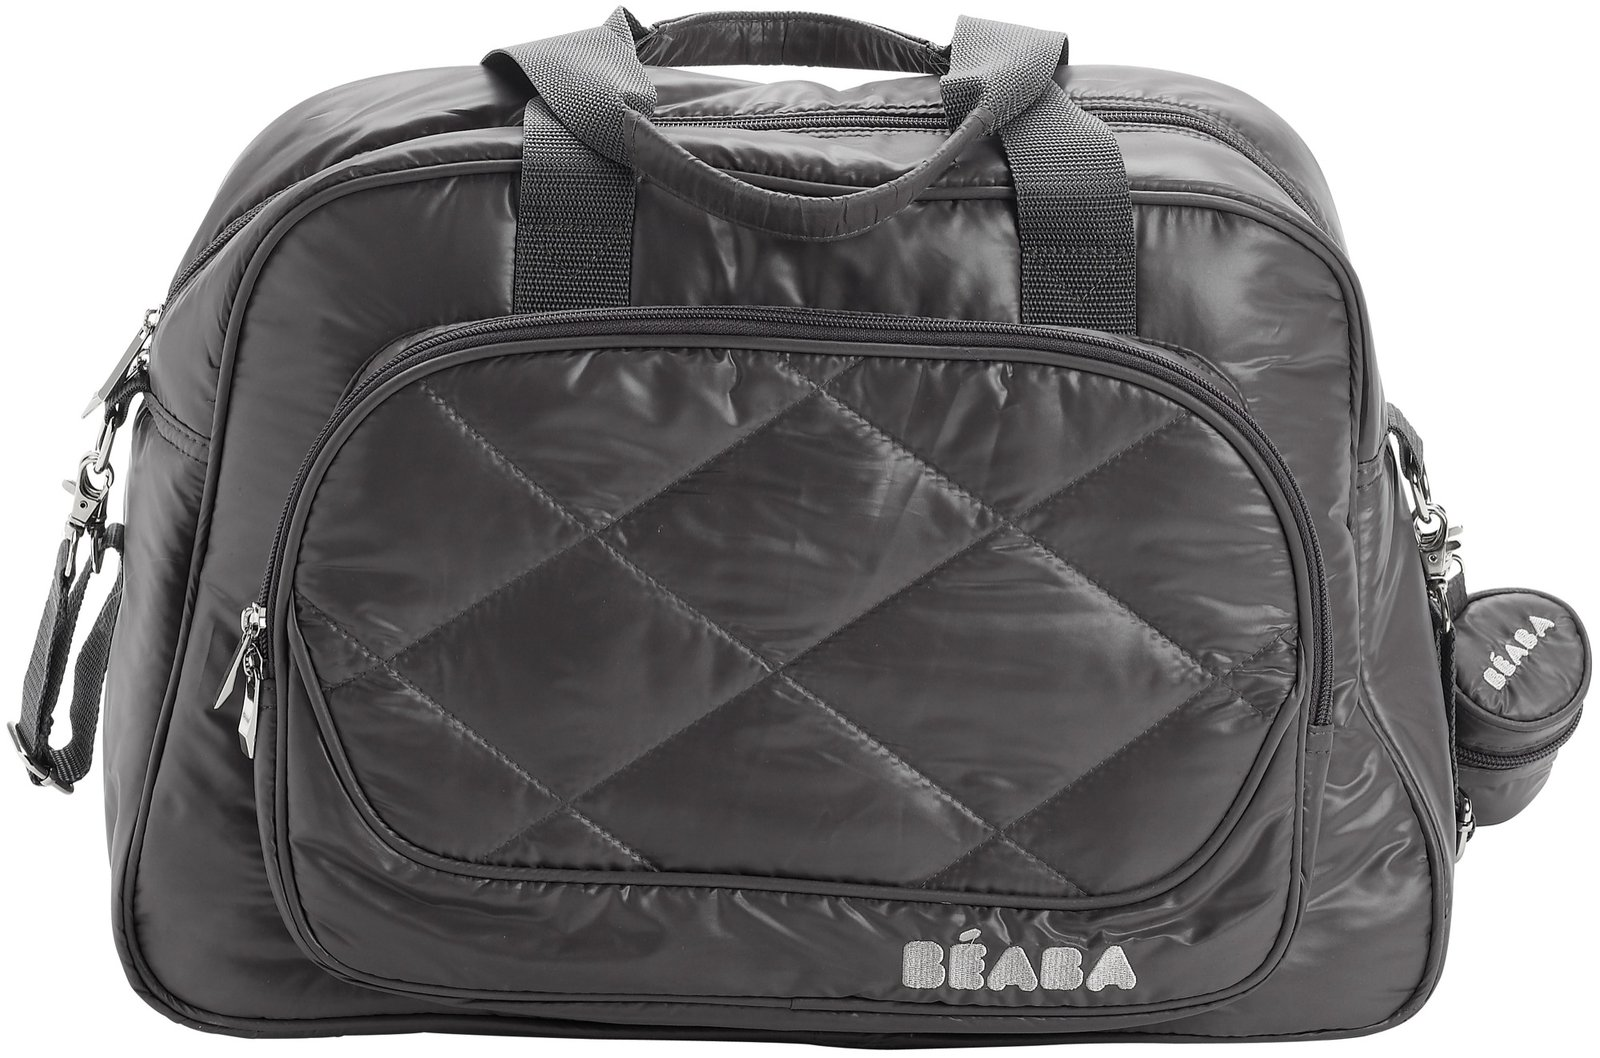 Beaba New York Diaper Bag